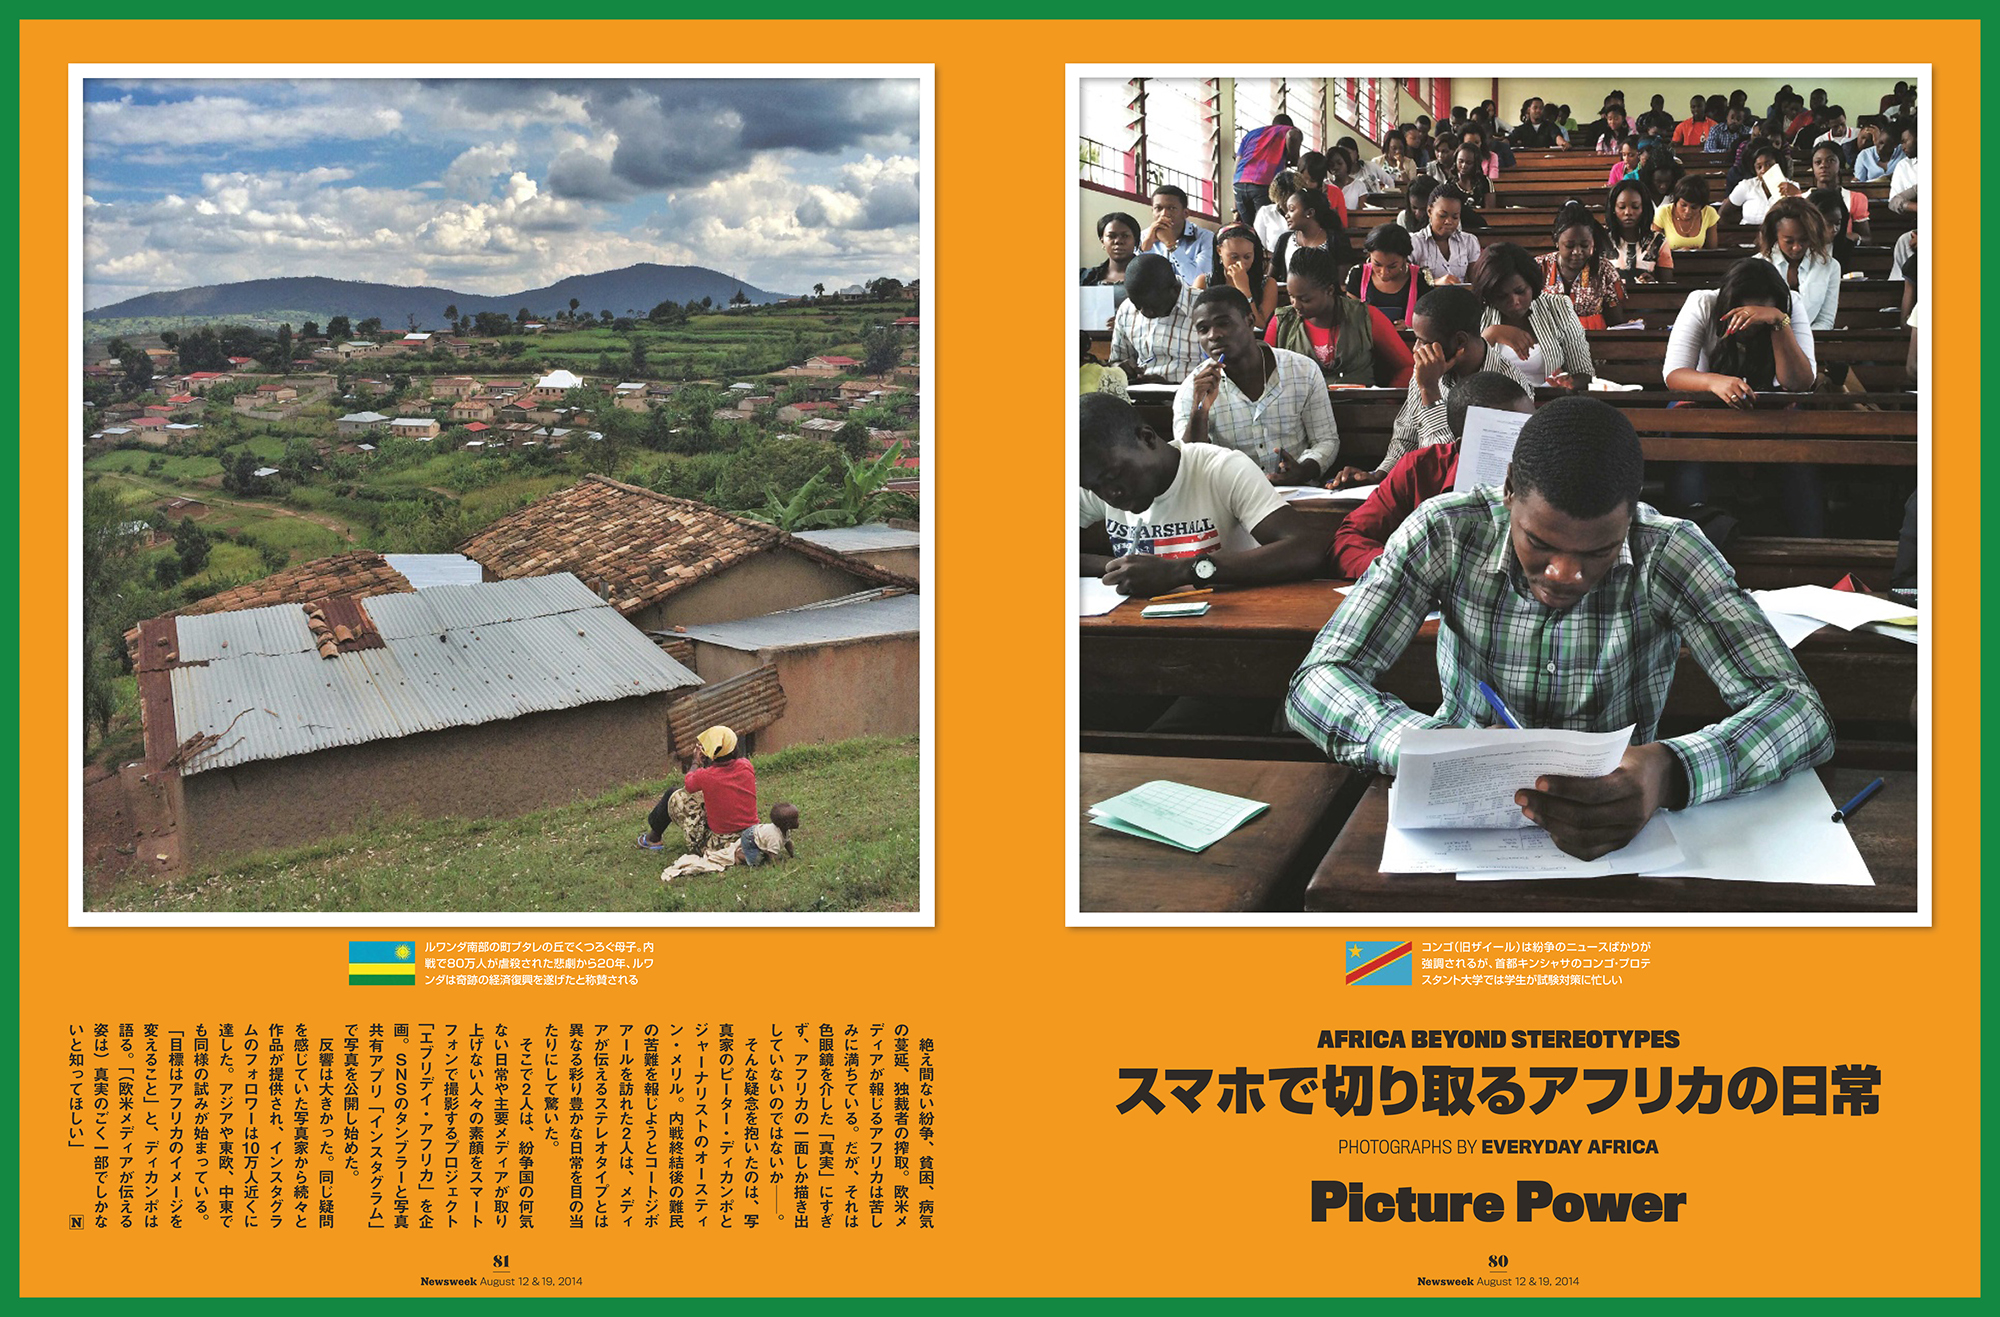 NewsweekJapan_August2014_1_mr.jpg